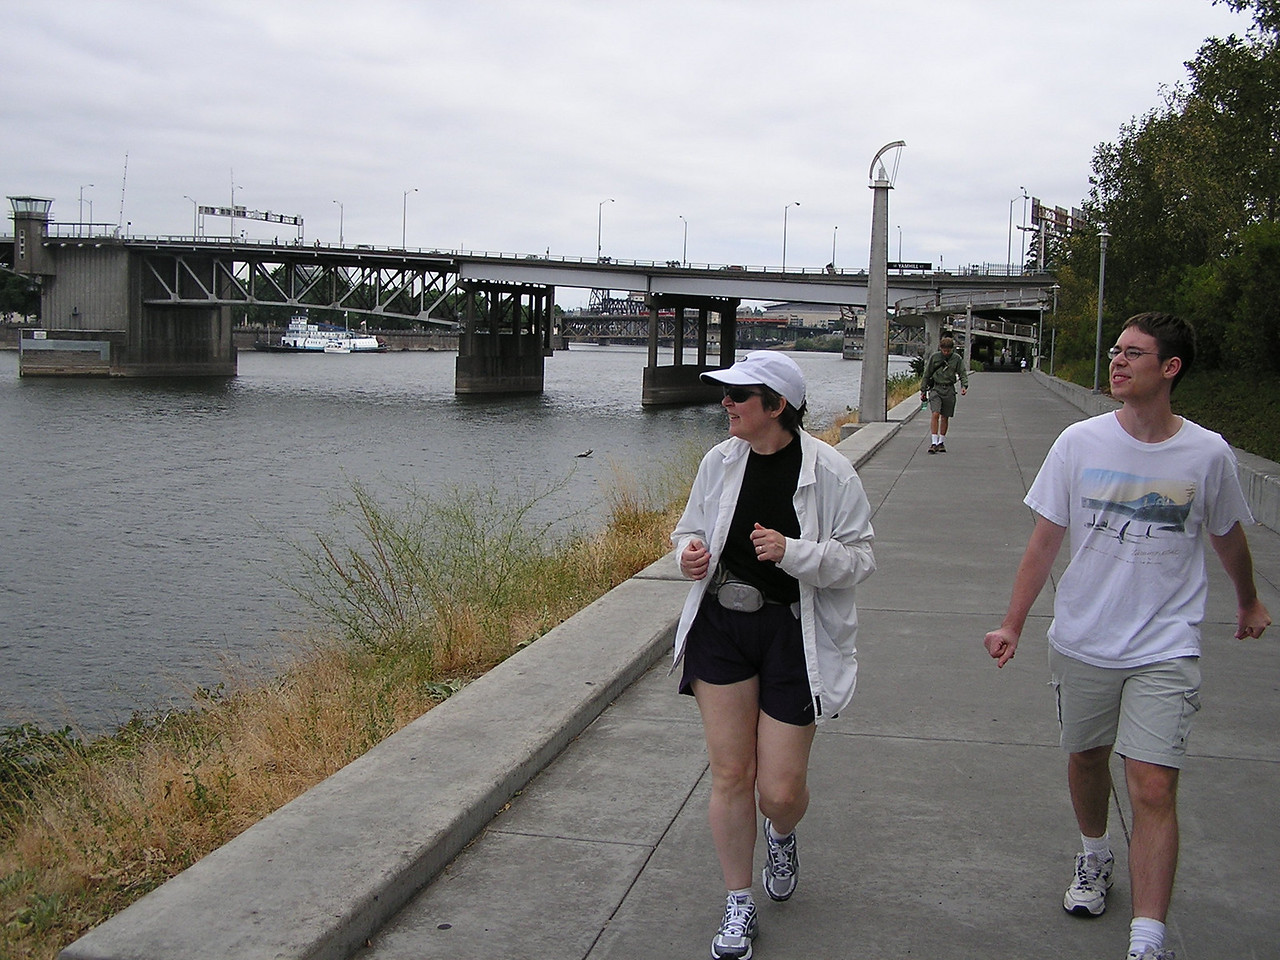 We walked under two bridges on the east side esplanade ...